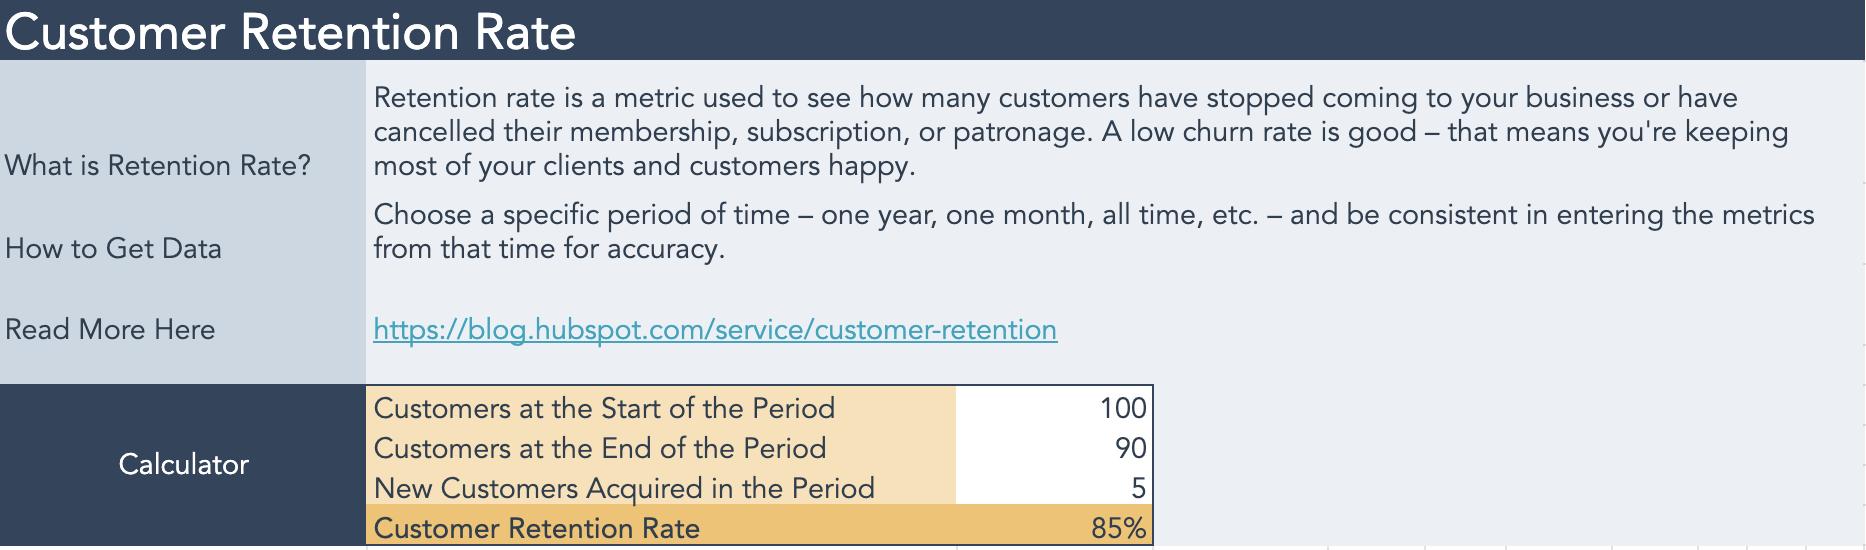 customer retention rate calculator